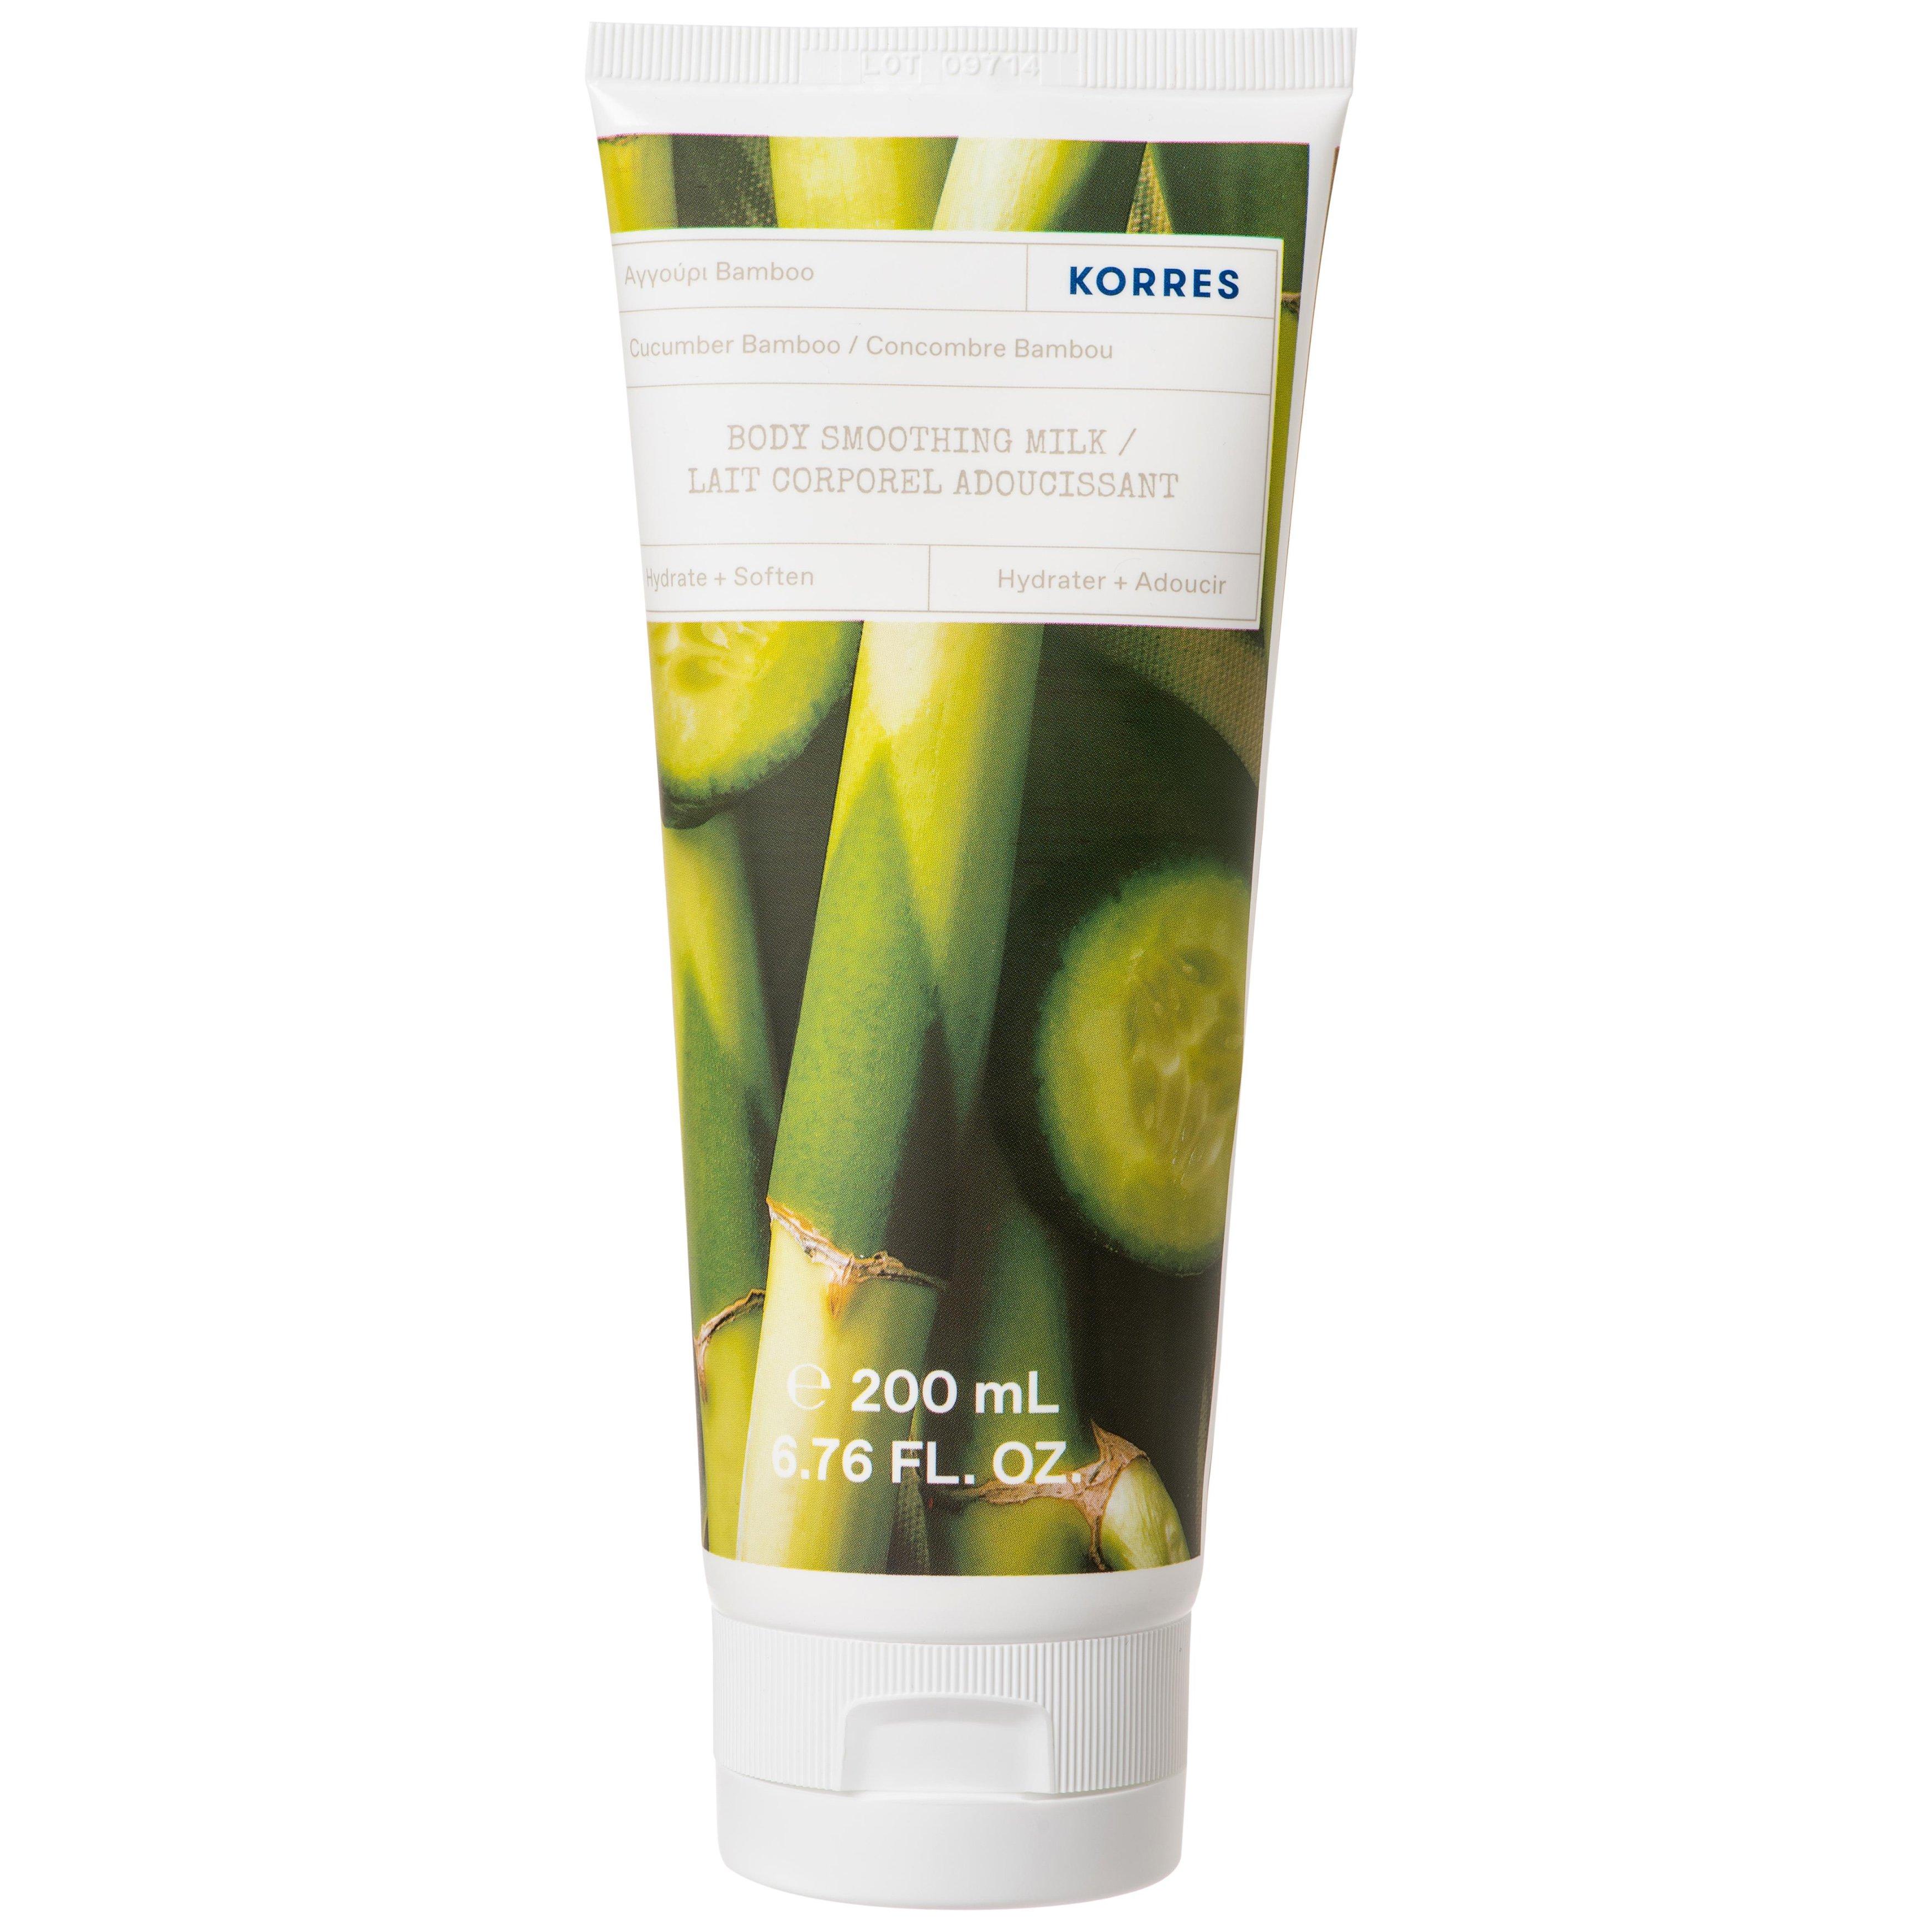 Korres Cucumber Bamboo Body Smoothing Milk Ενυδατικό Γαλάκτωμα Σώματος με Άρωμα Αγγούρι Bamboo 200ml